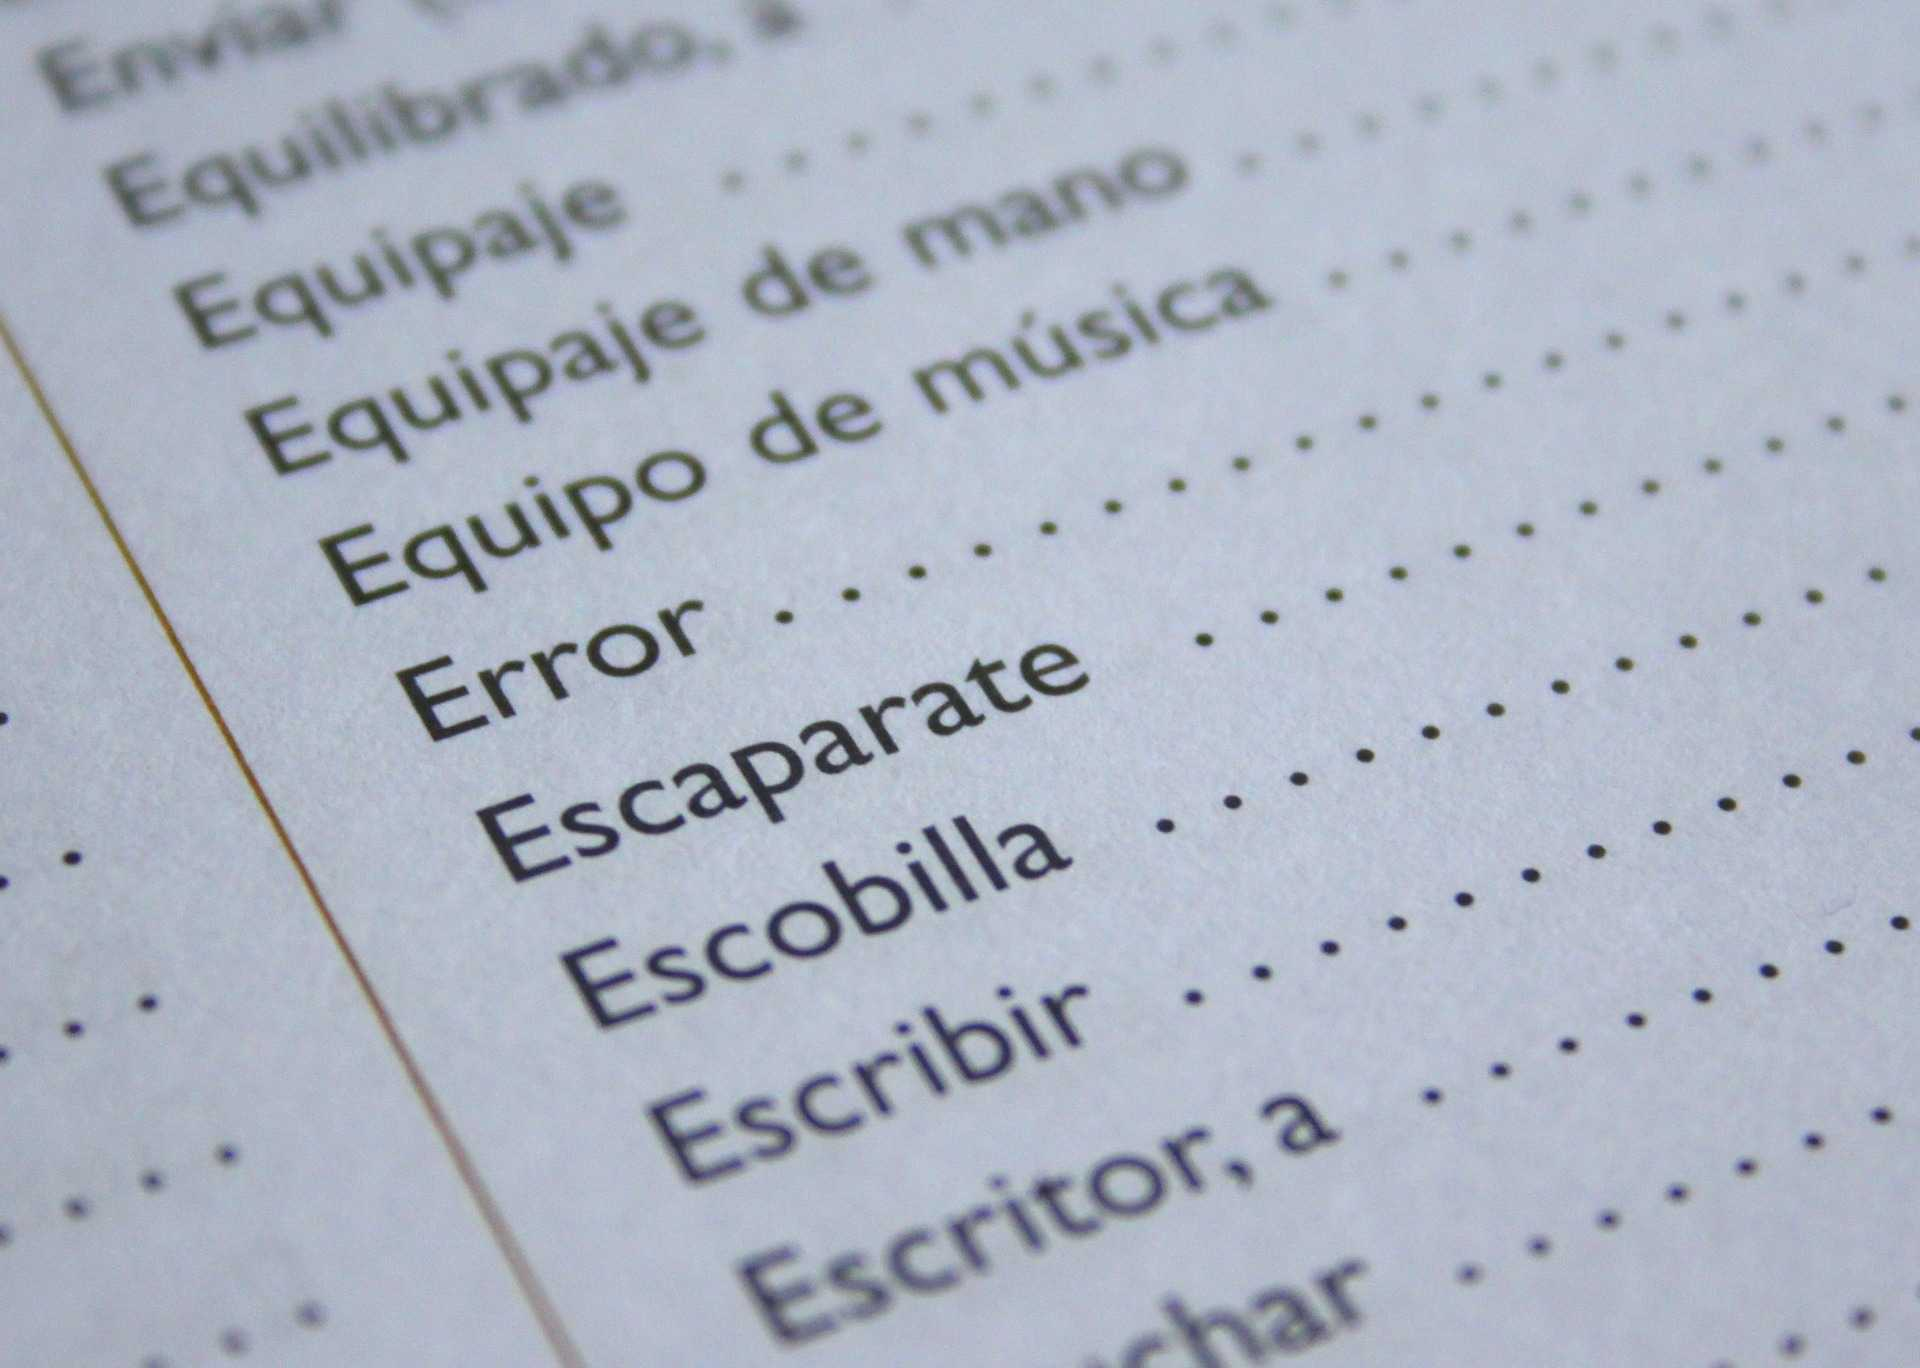 PIEDMONT DROPS SPANISH PROGRAM